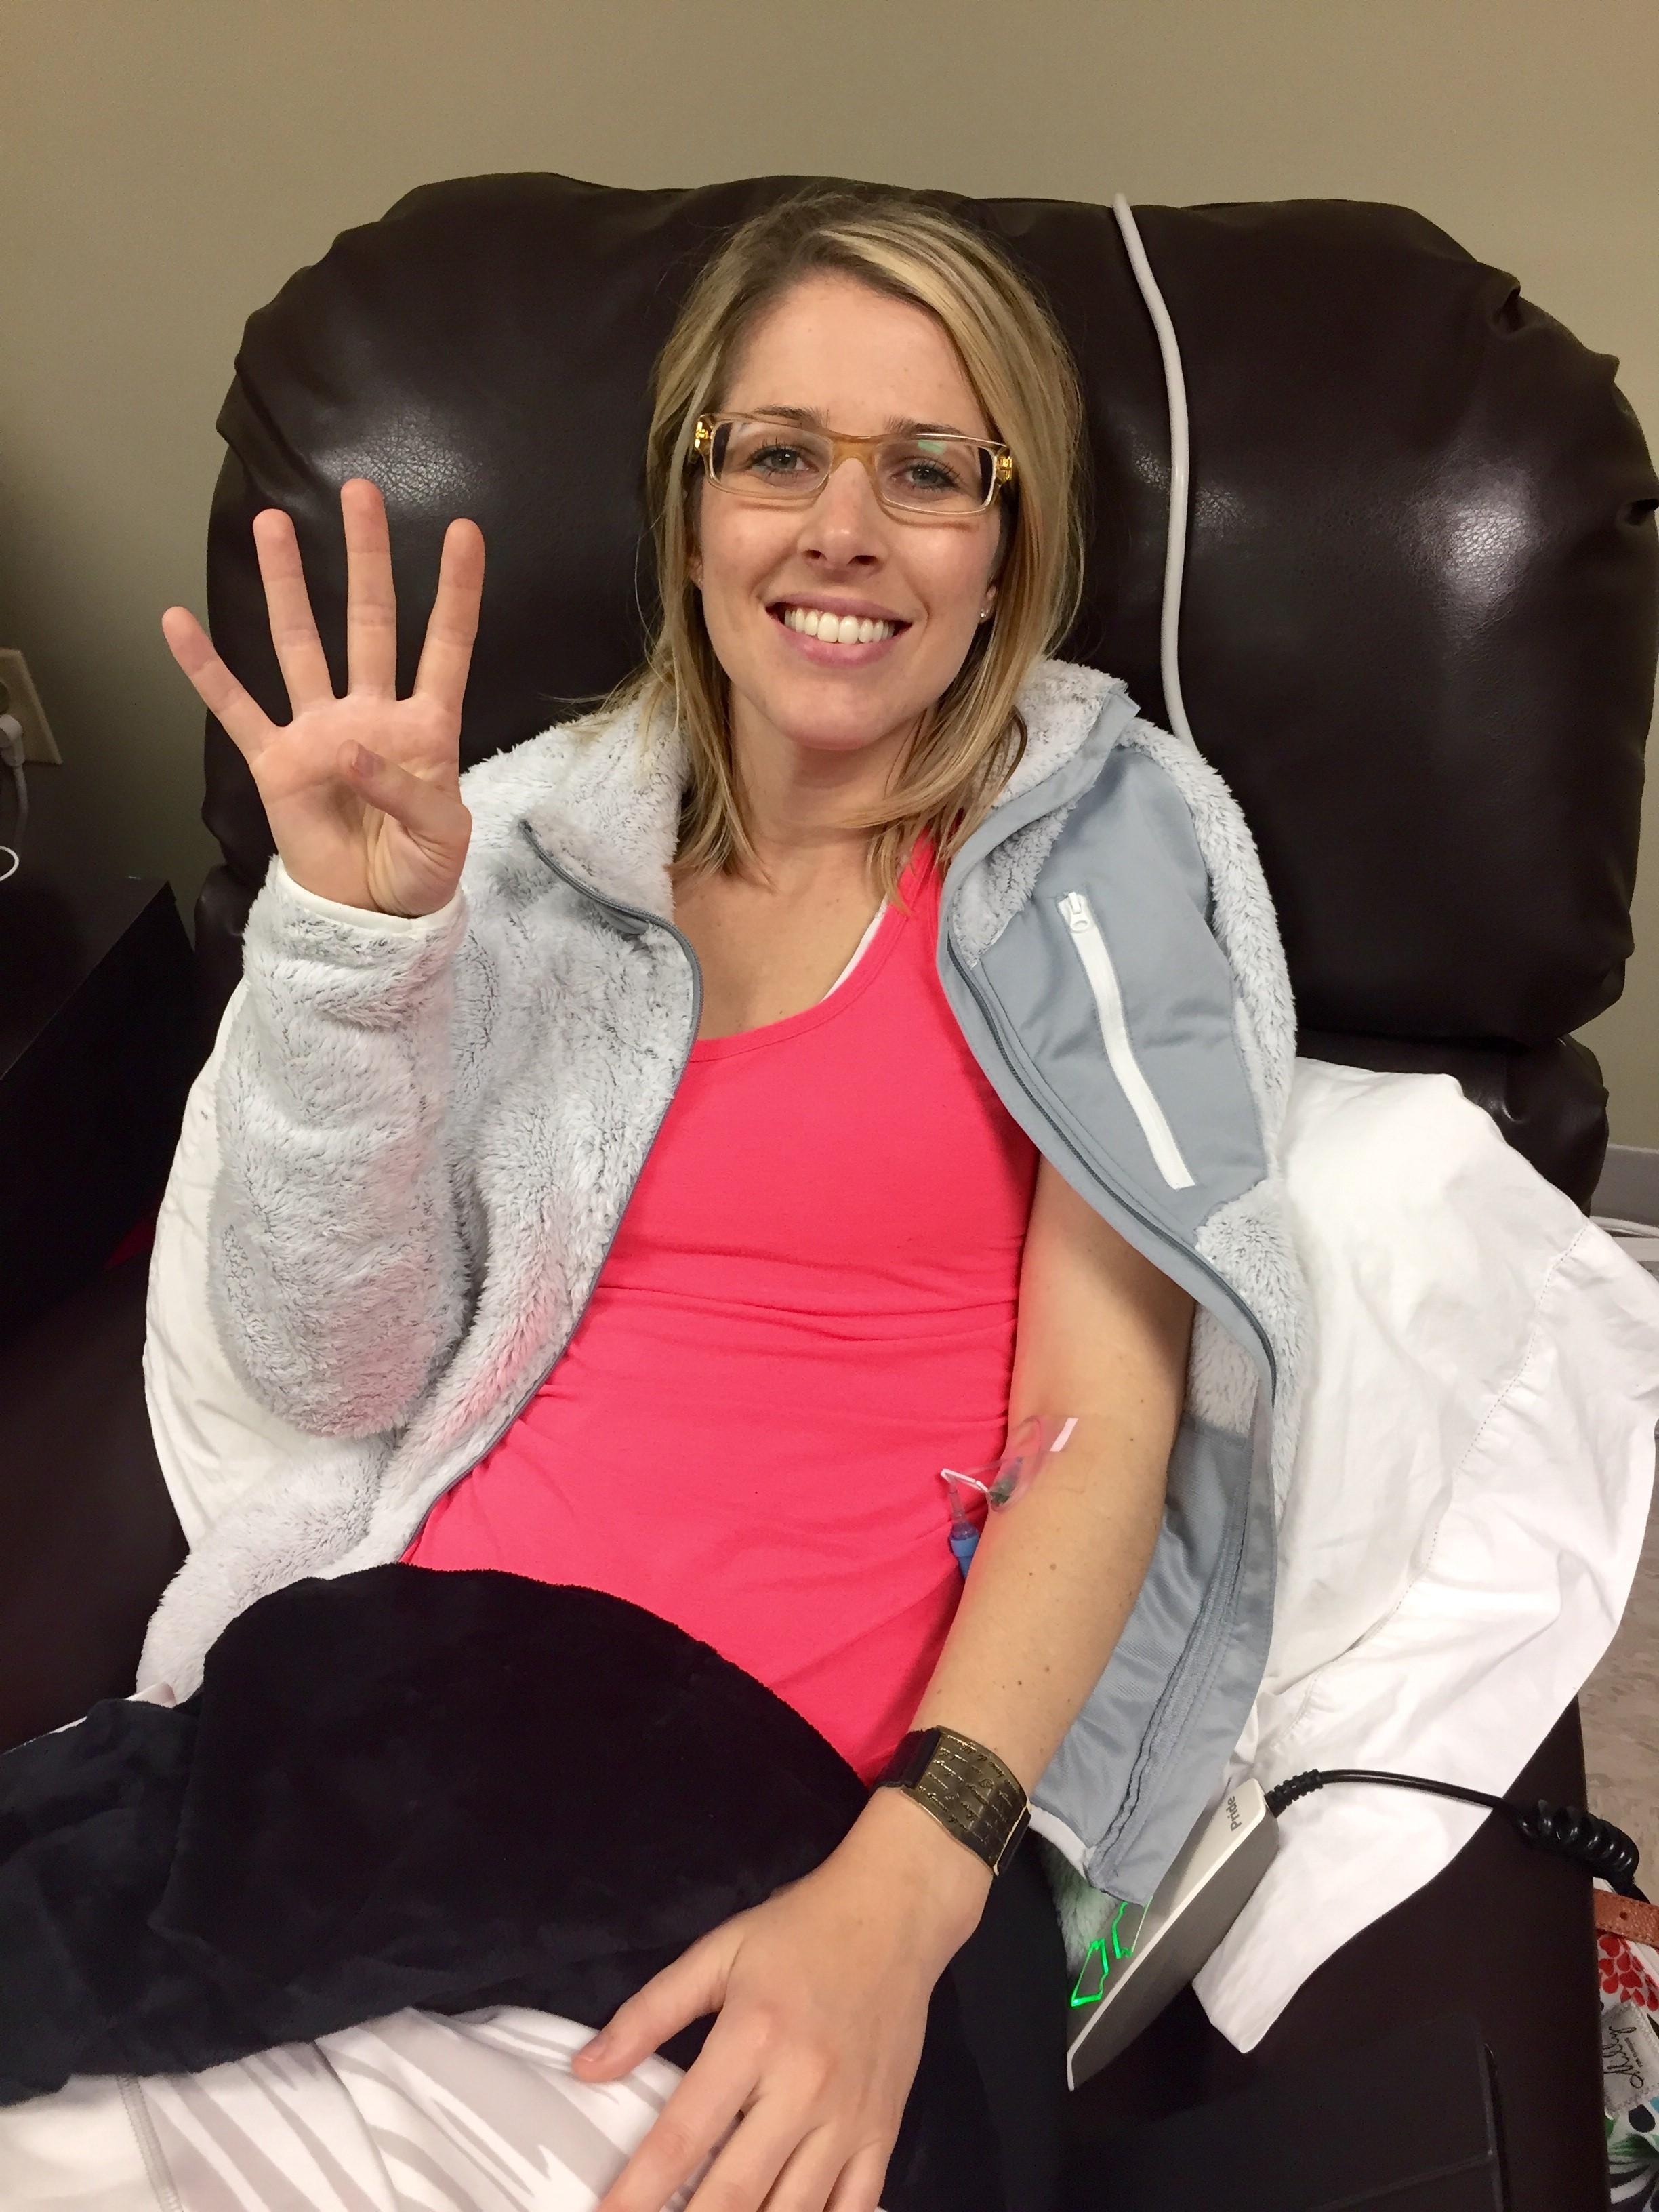 Leah Quartano-Bowling mutiple sclerosis